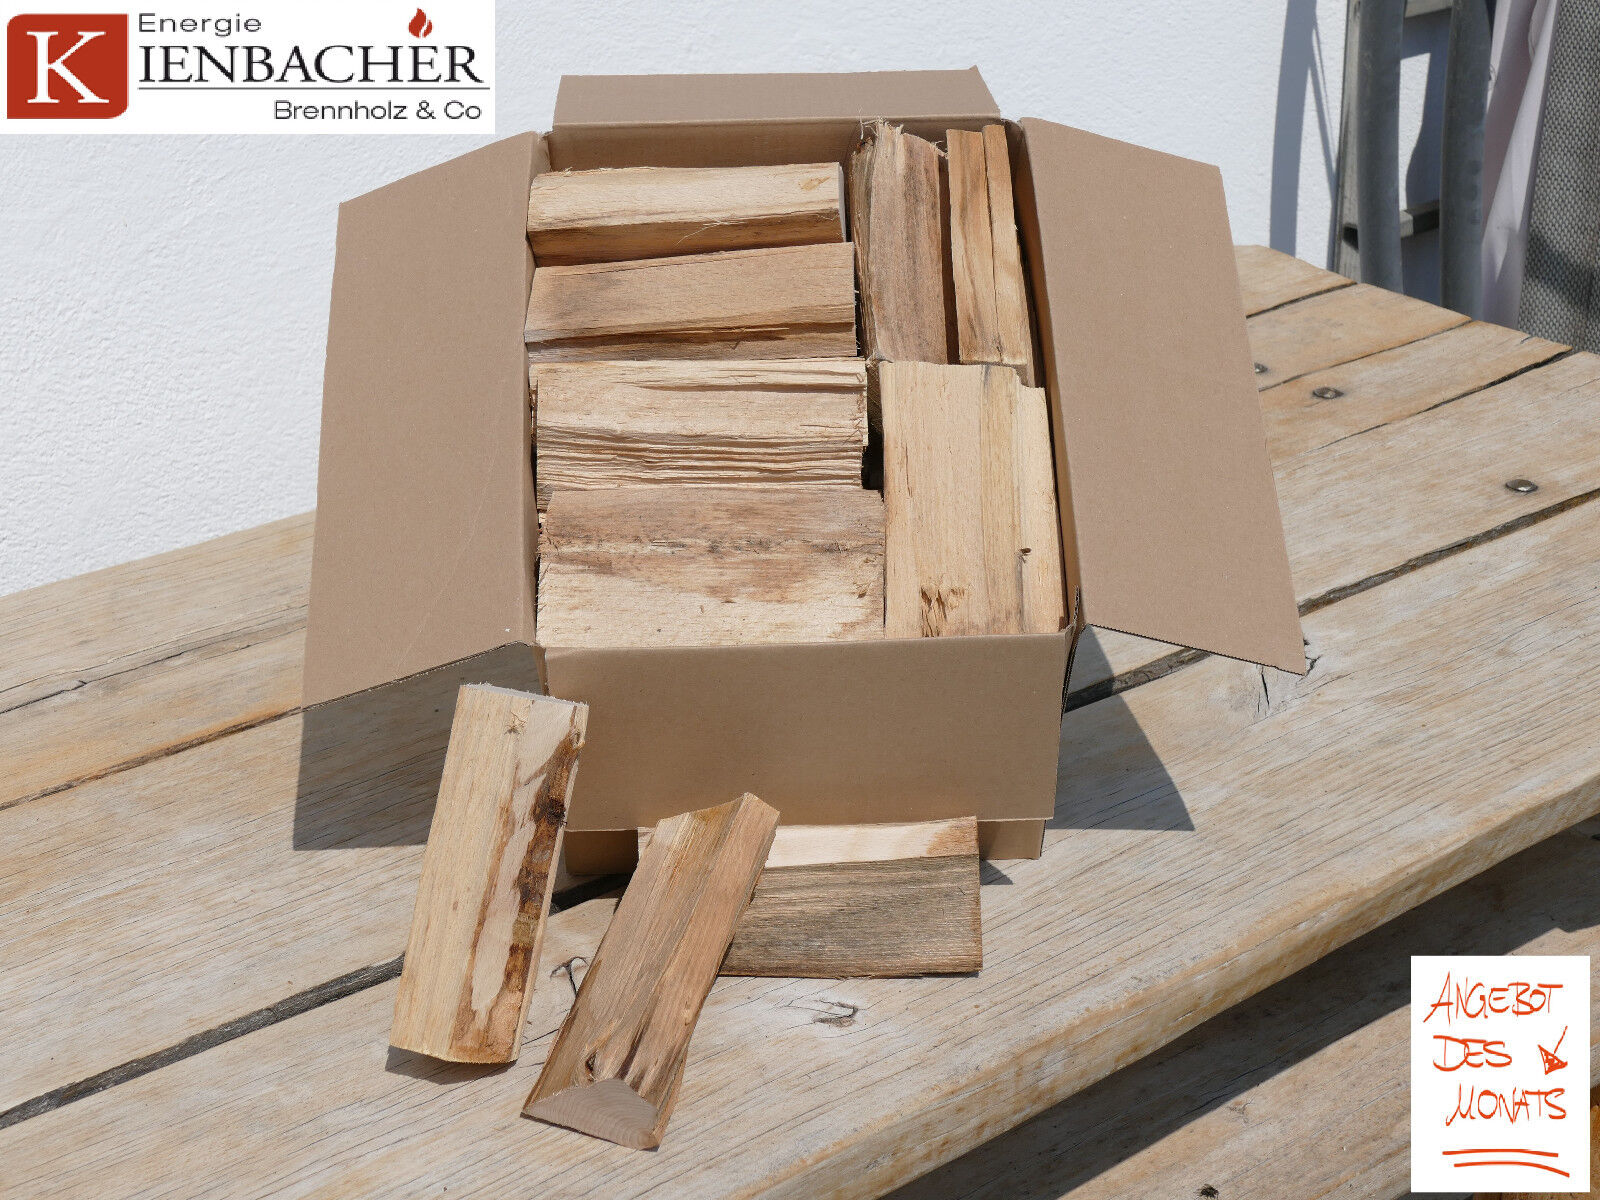 10 Kg Wood Chunks Buche 15cm BBQ Smoker-/Räucherholz zum smoken räuchern grillen